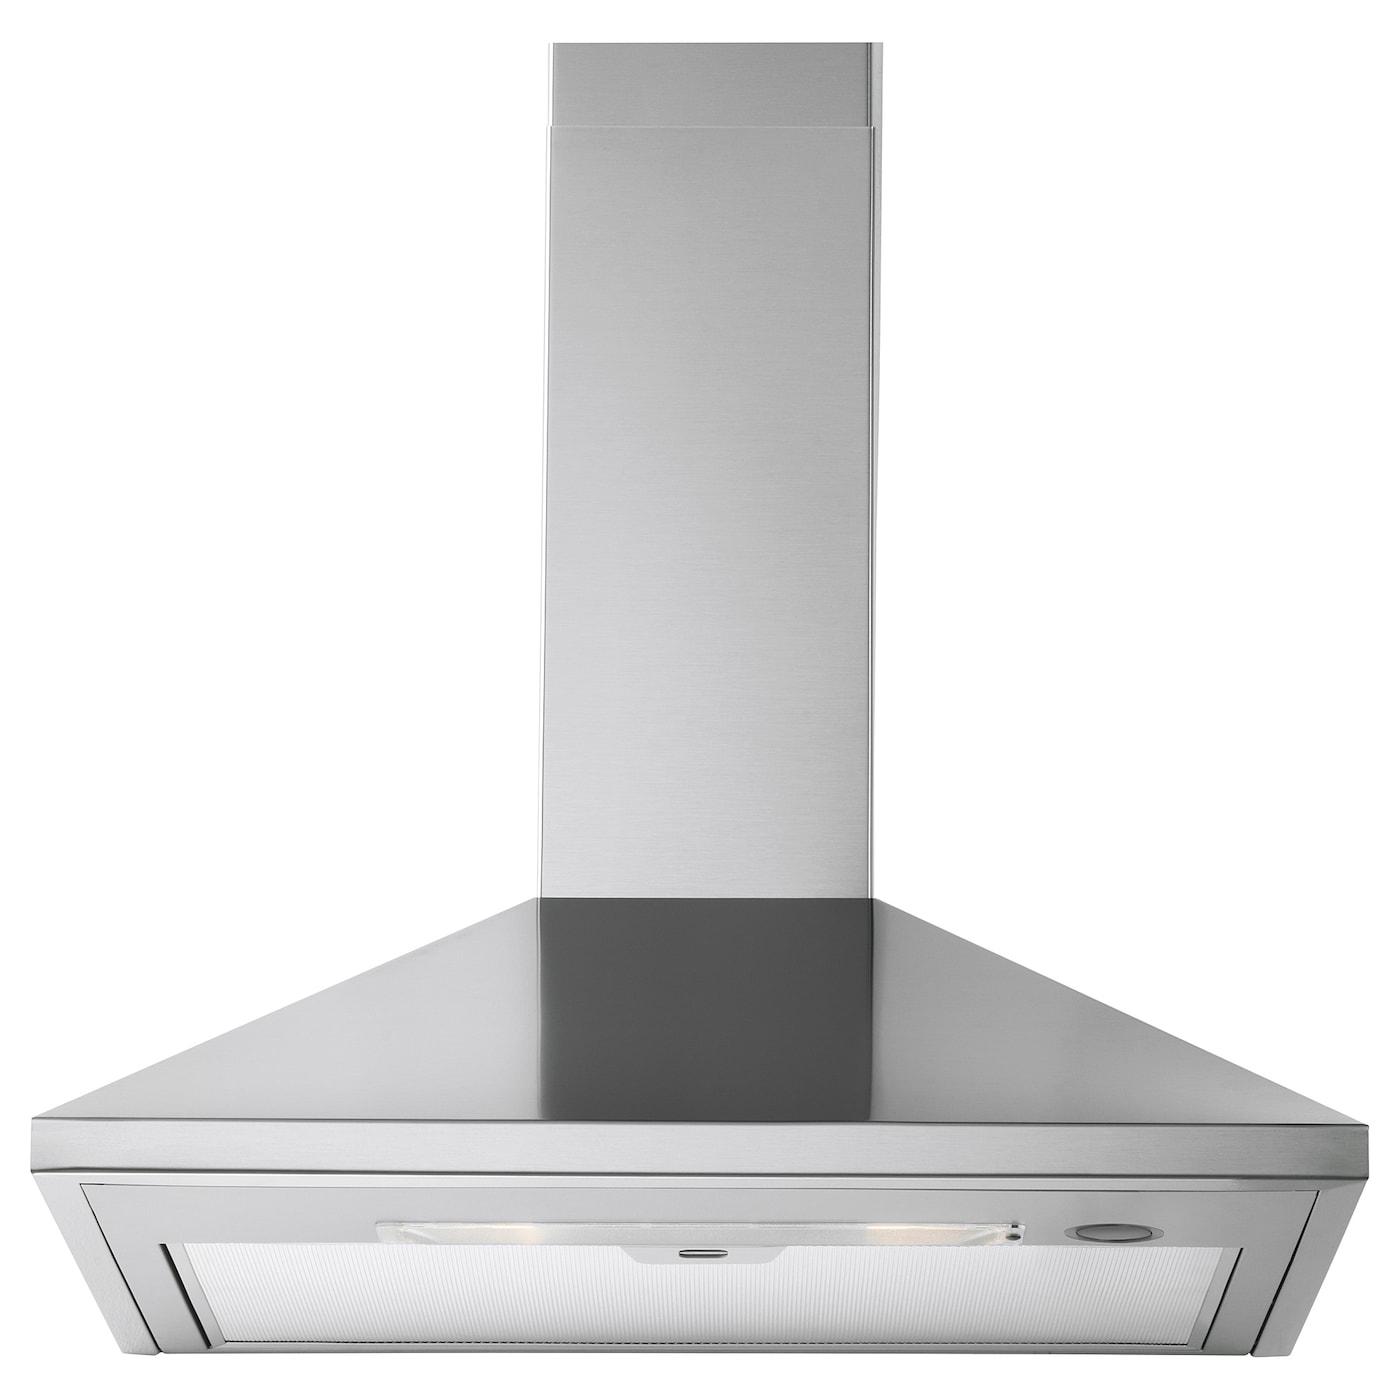 cooker hoods kitchen extractor fans ikea. Black Bedroom Furniture Sets. Home Design Ideas